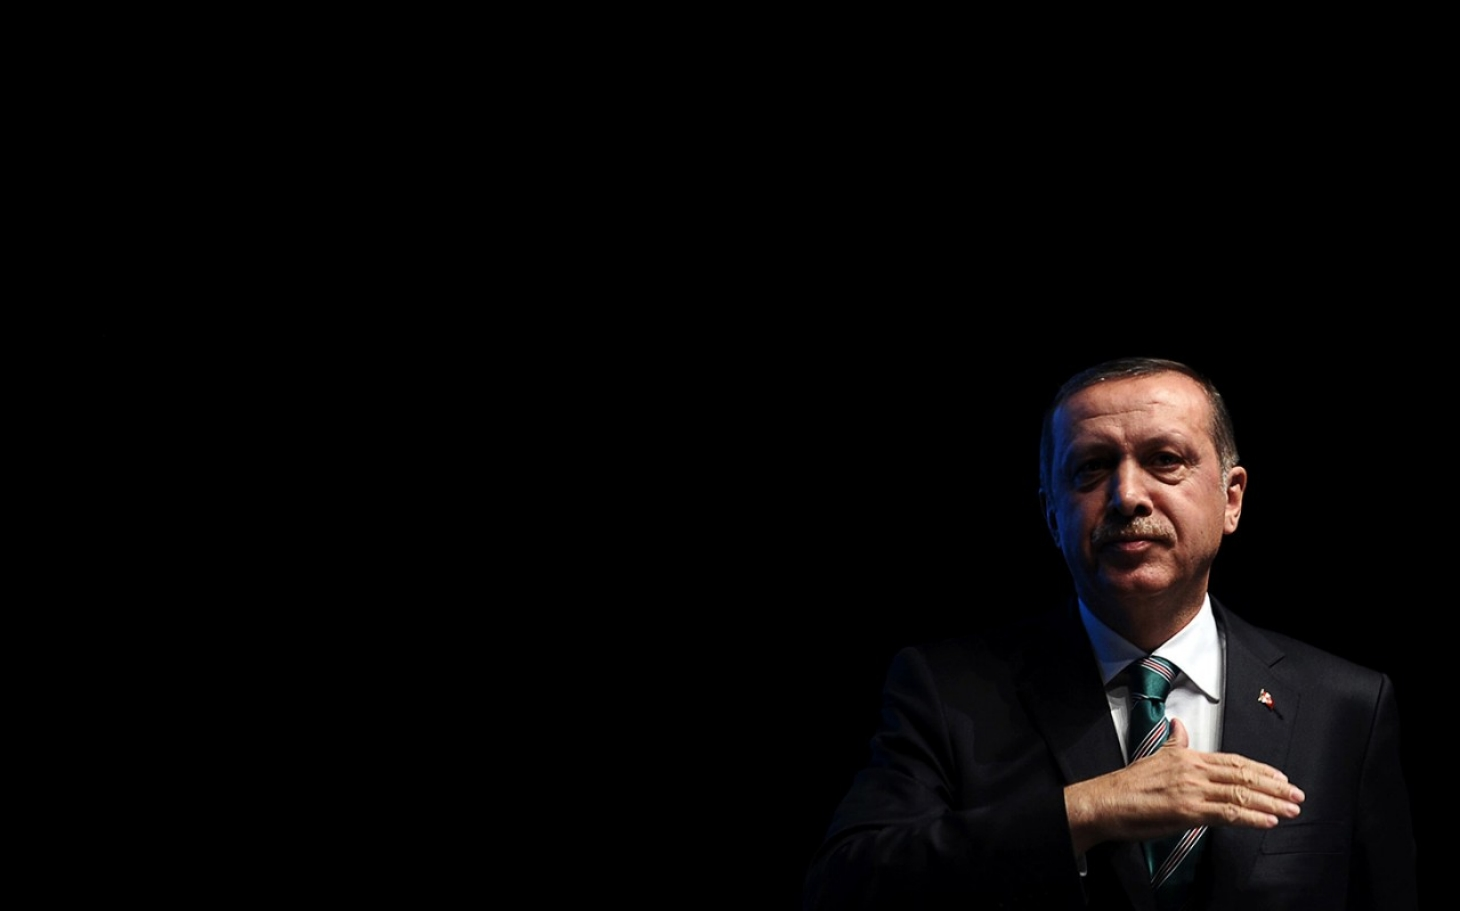 It's Erdogan Vs - Public Speaking (#1193812) - HD Wallpaper & Backgrounds  Download